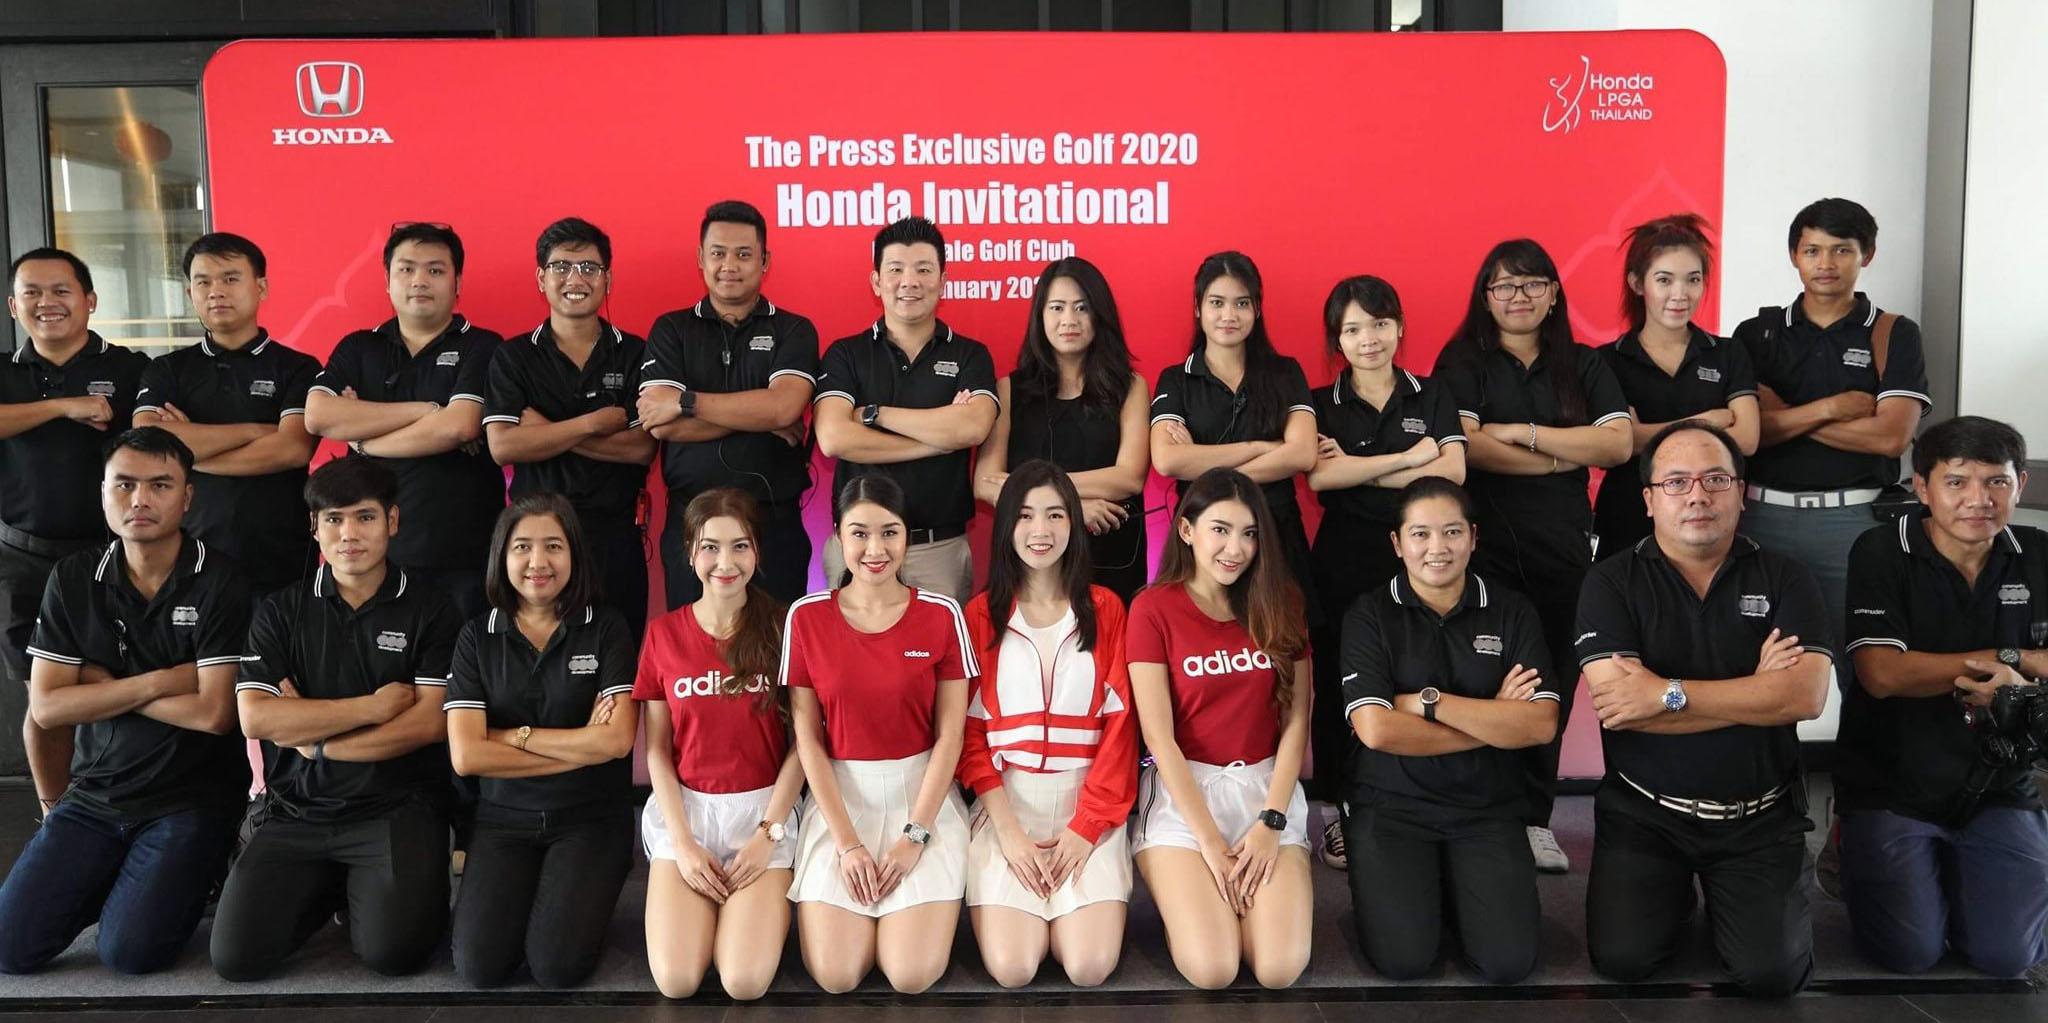 Thaigolfguru Event Team ทีมงานจัดแข่งกอล์ฟ